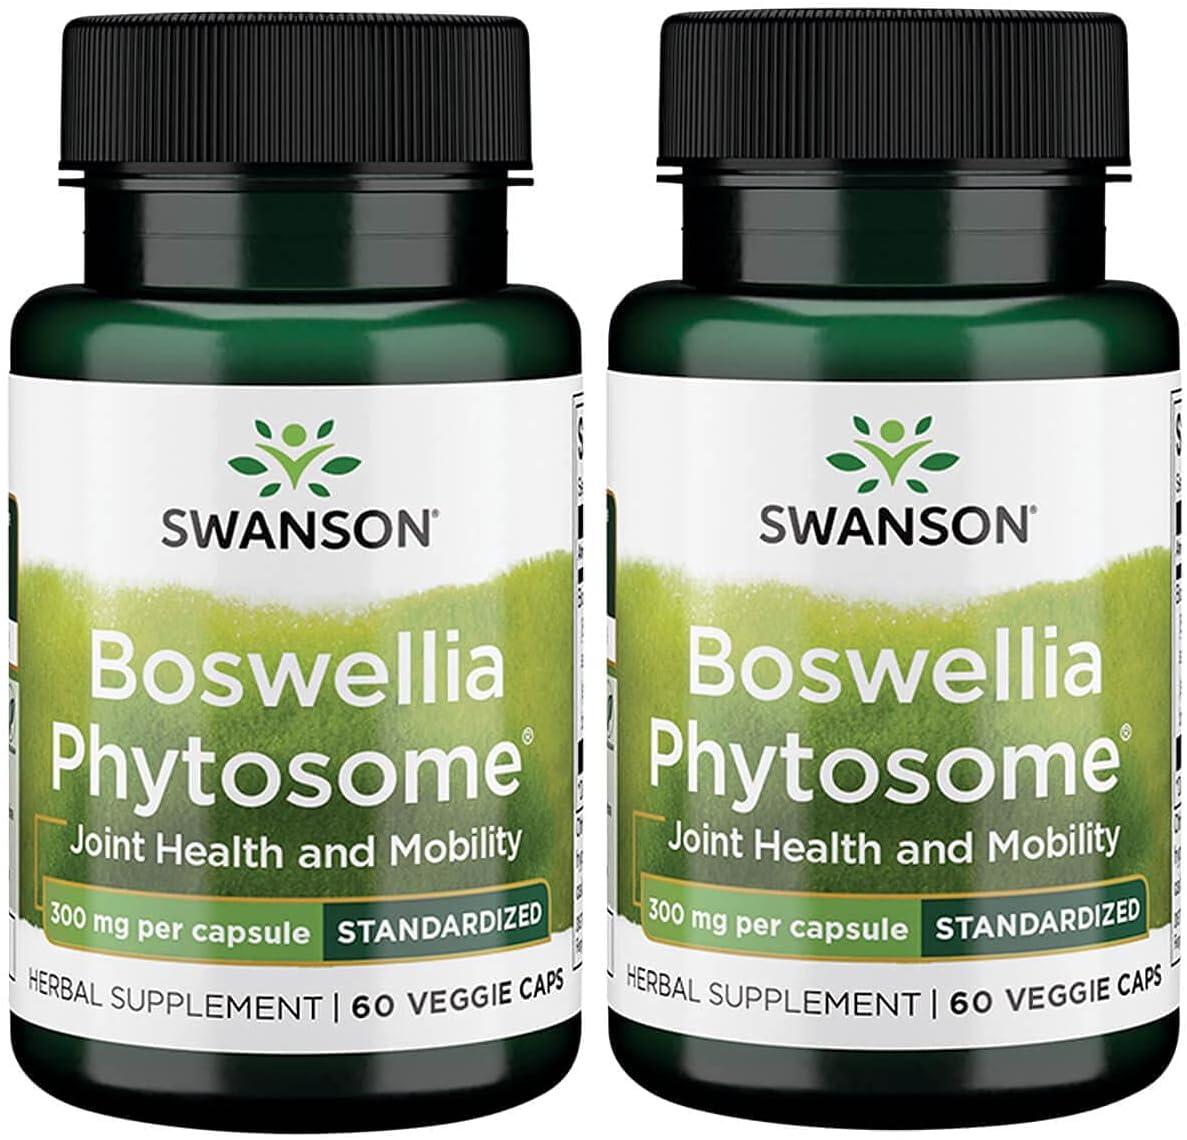 Swanson Standardized Boswellia Phytosome 着後レビューで 送料無料 300 現品 Veg C 60 Milligrams